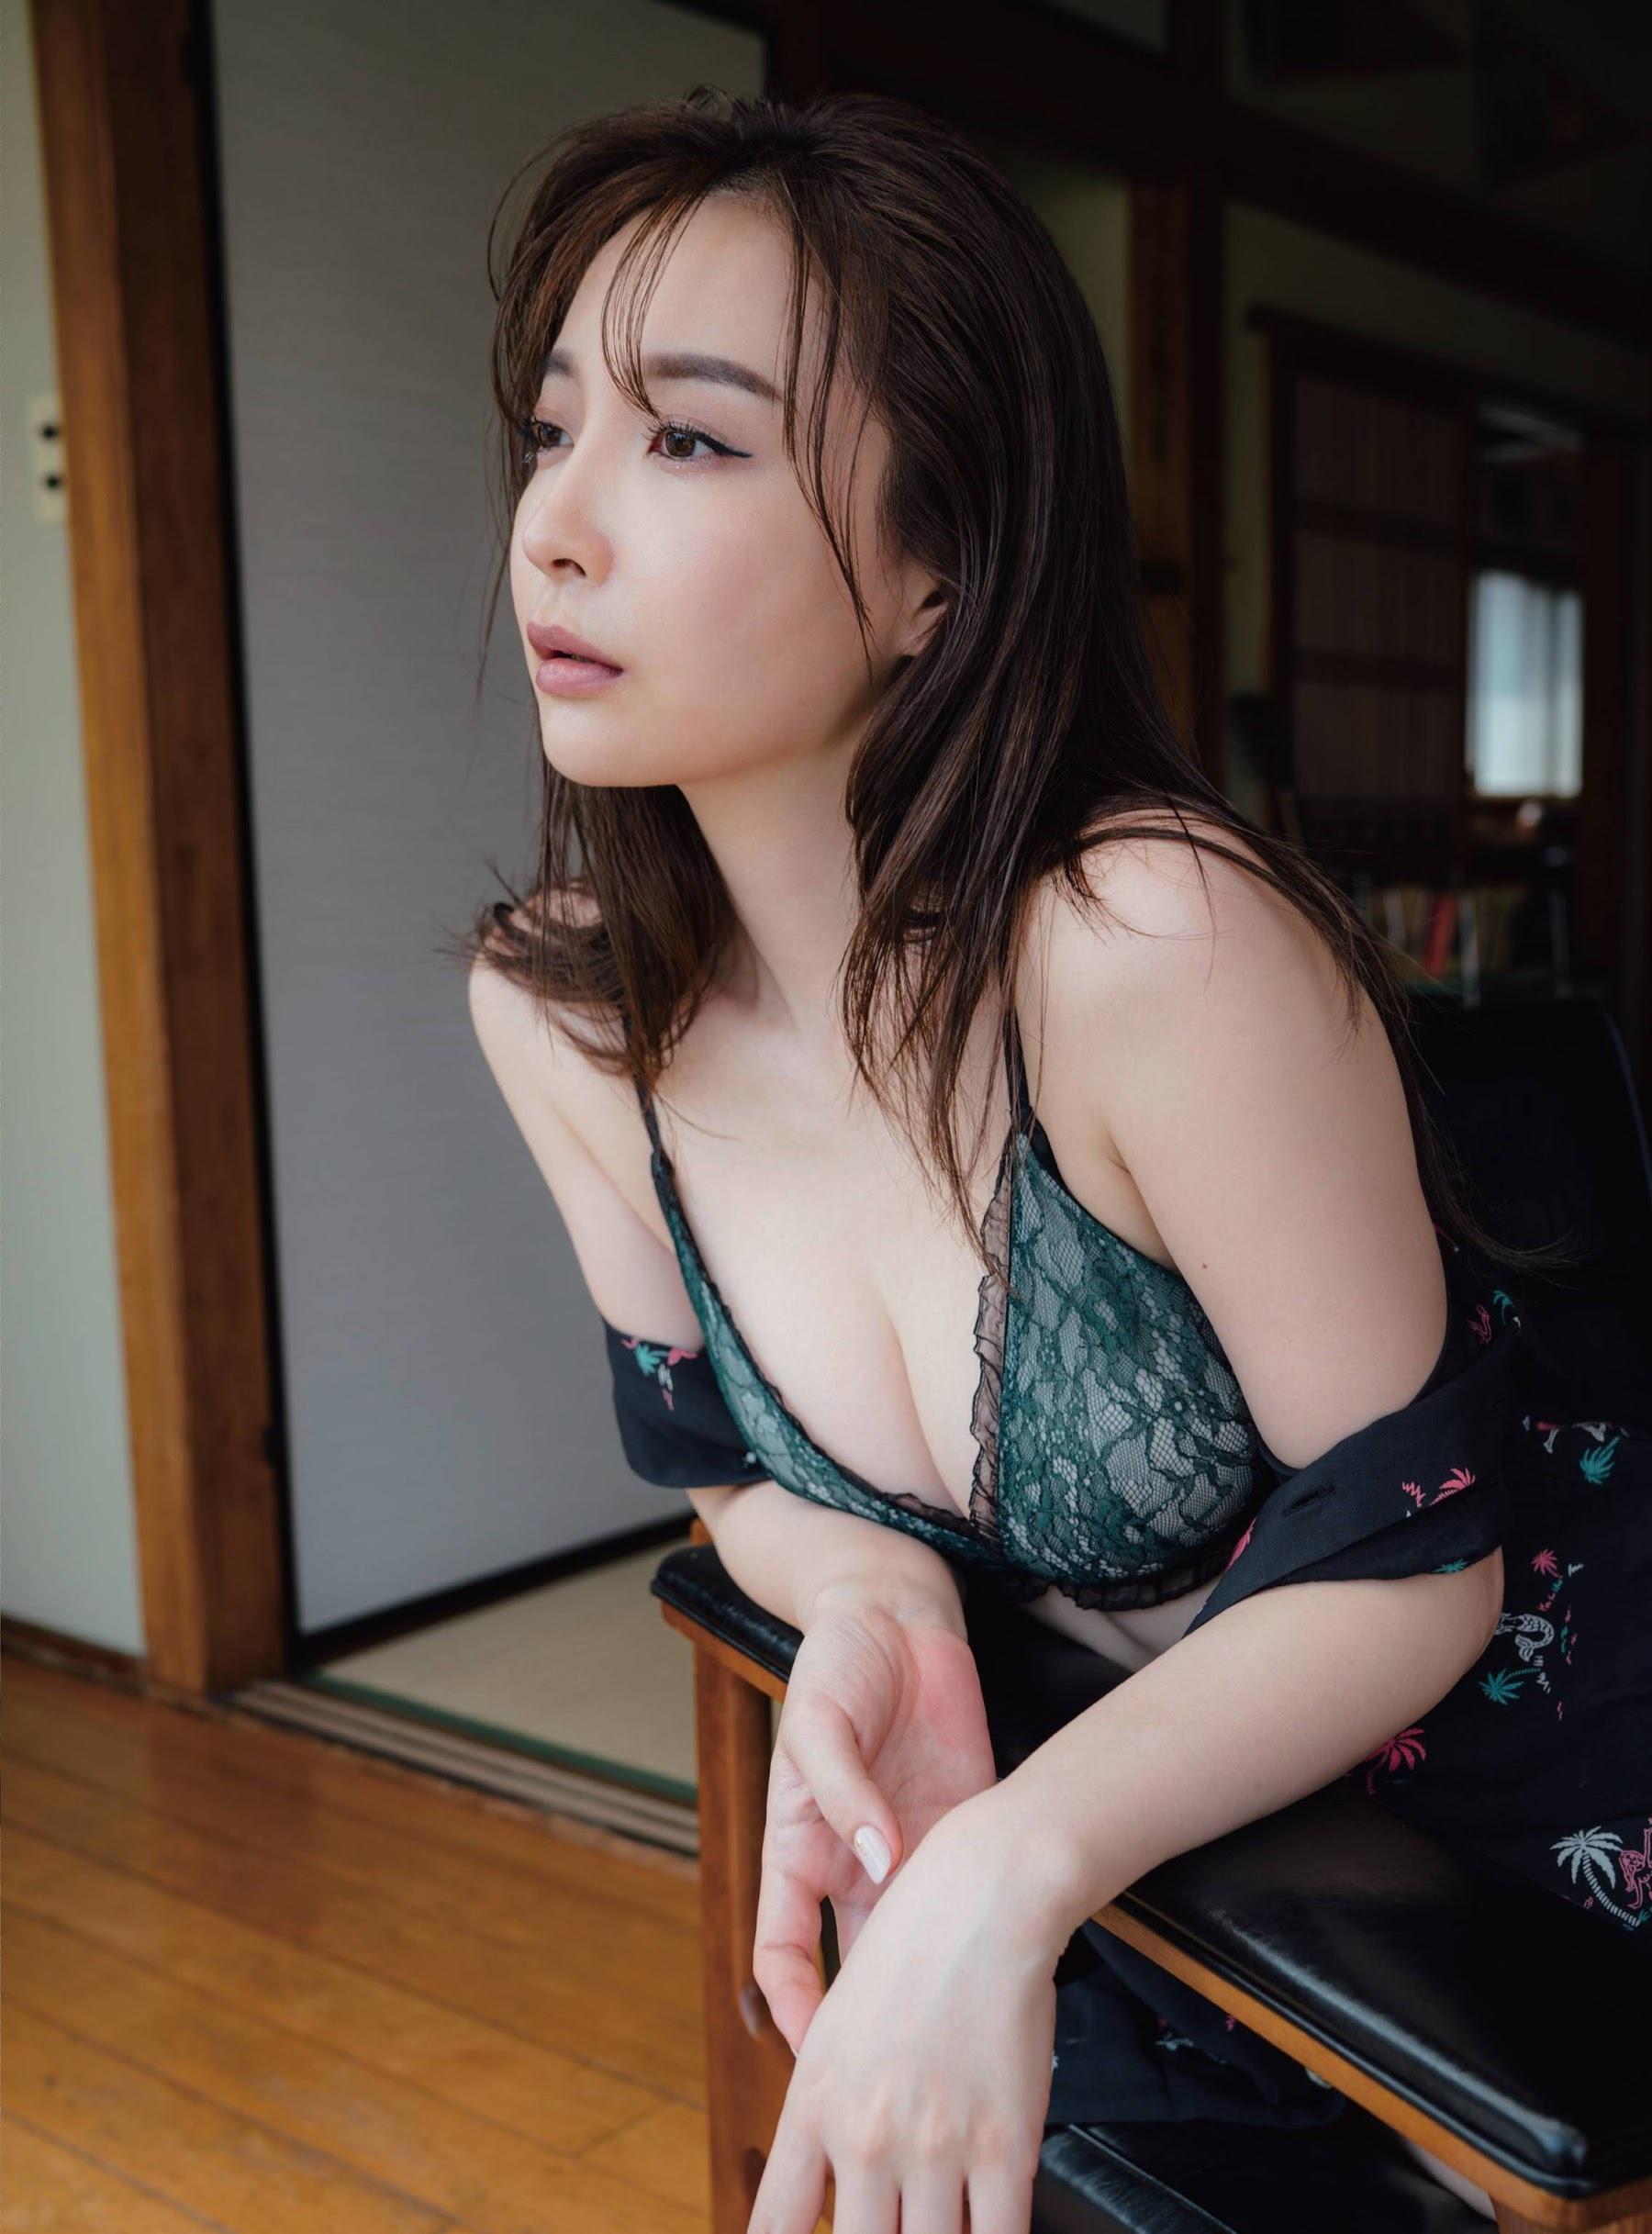 Ultimate beautiful ass Wataru Takeuchi gravure swimsuit picture002